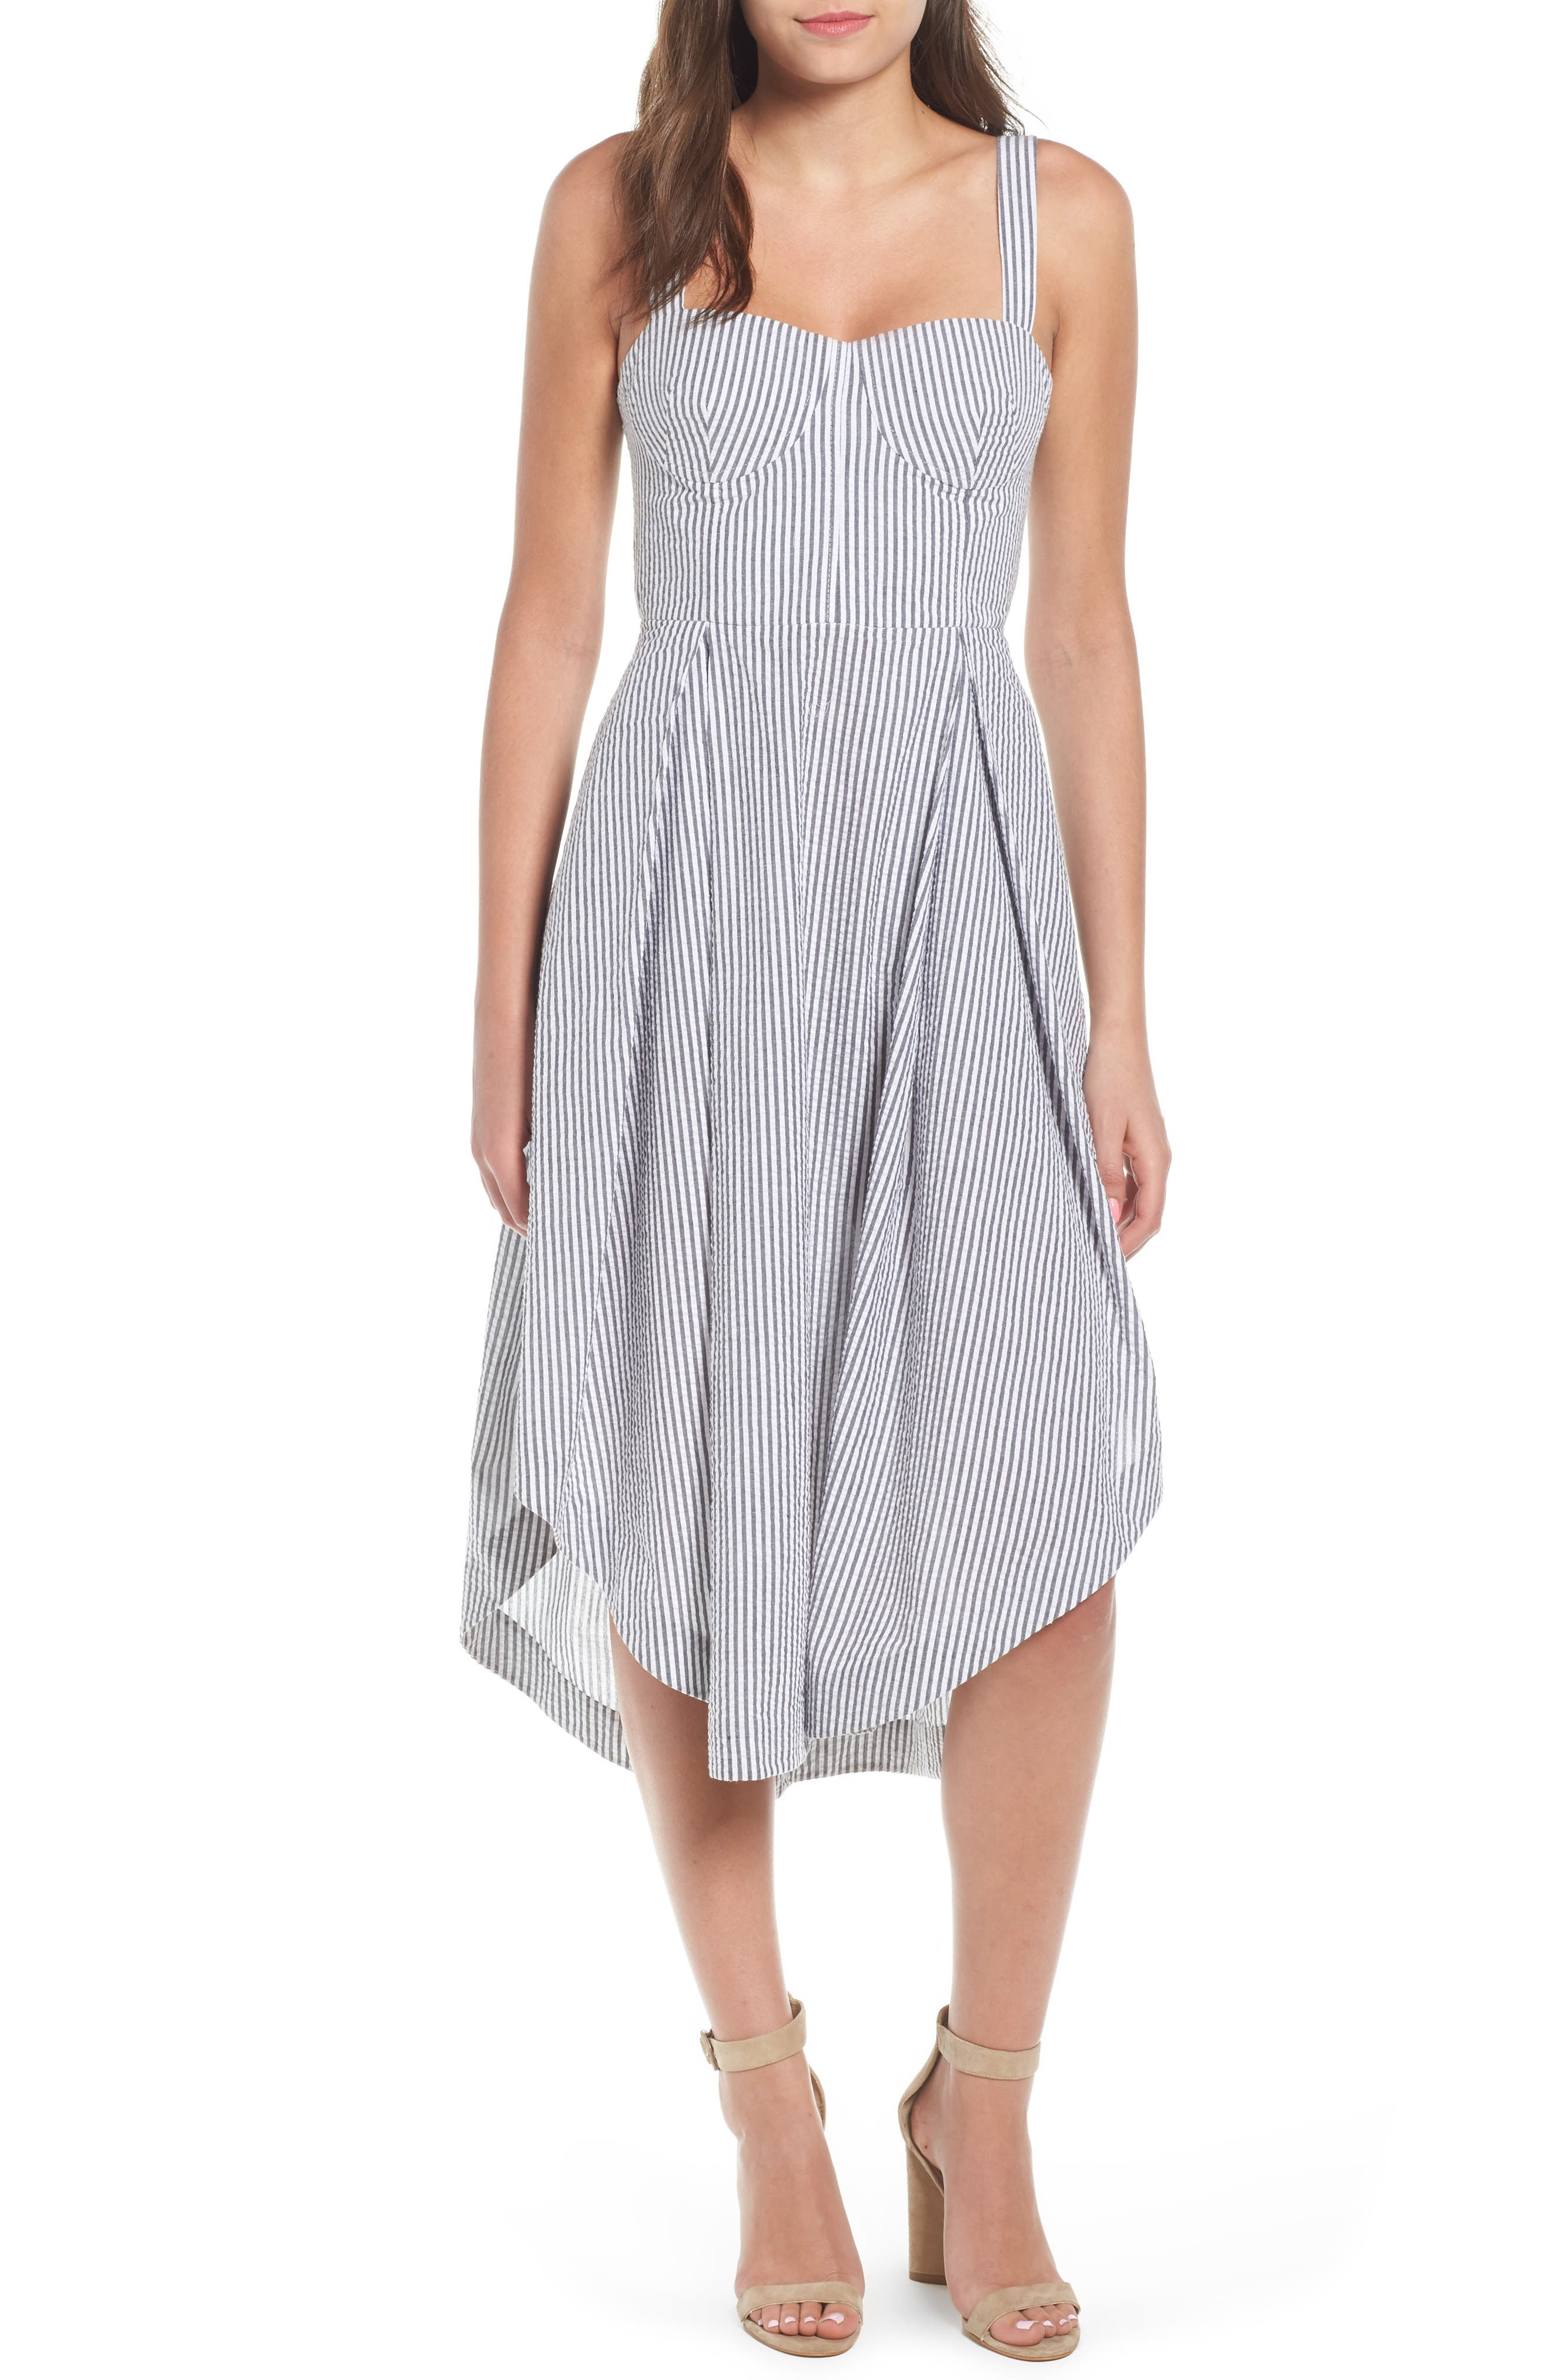 Seersucker Bustier Midi Dress,                         Main,                         color, Black/ White Multi